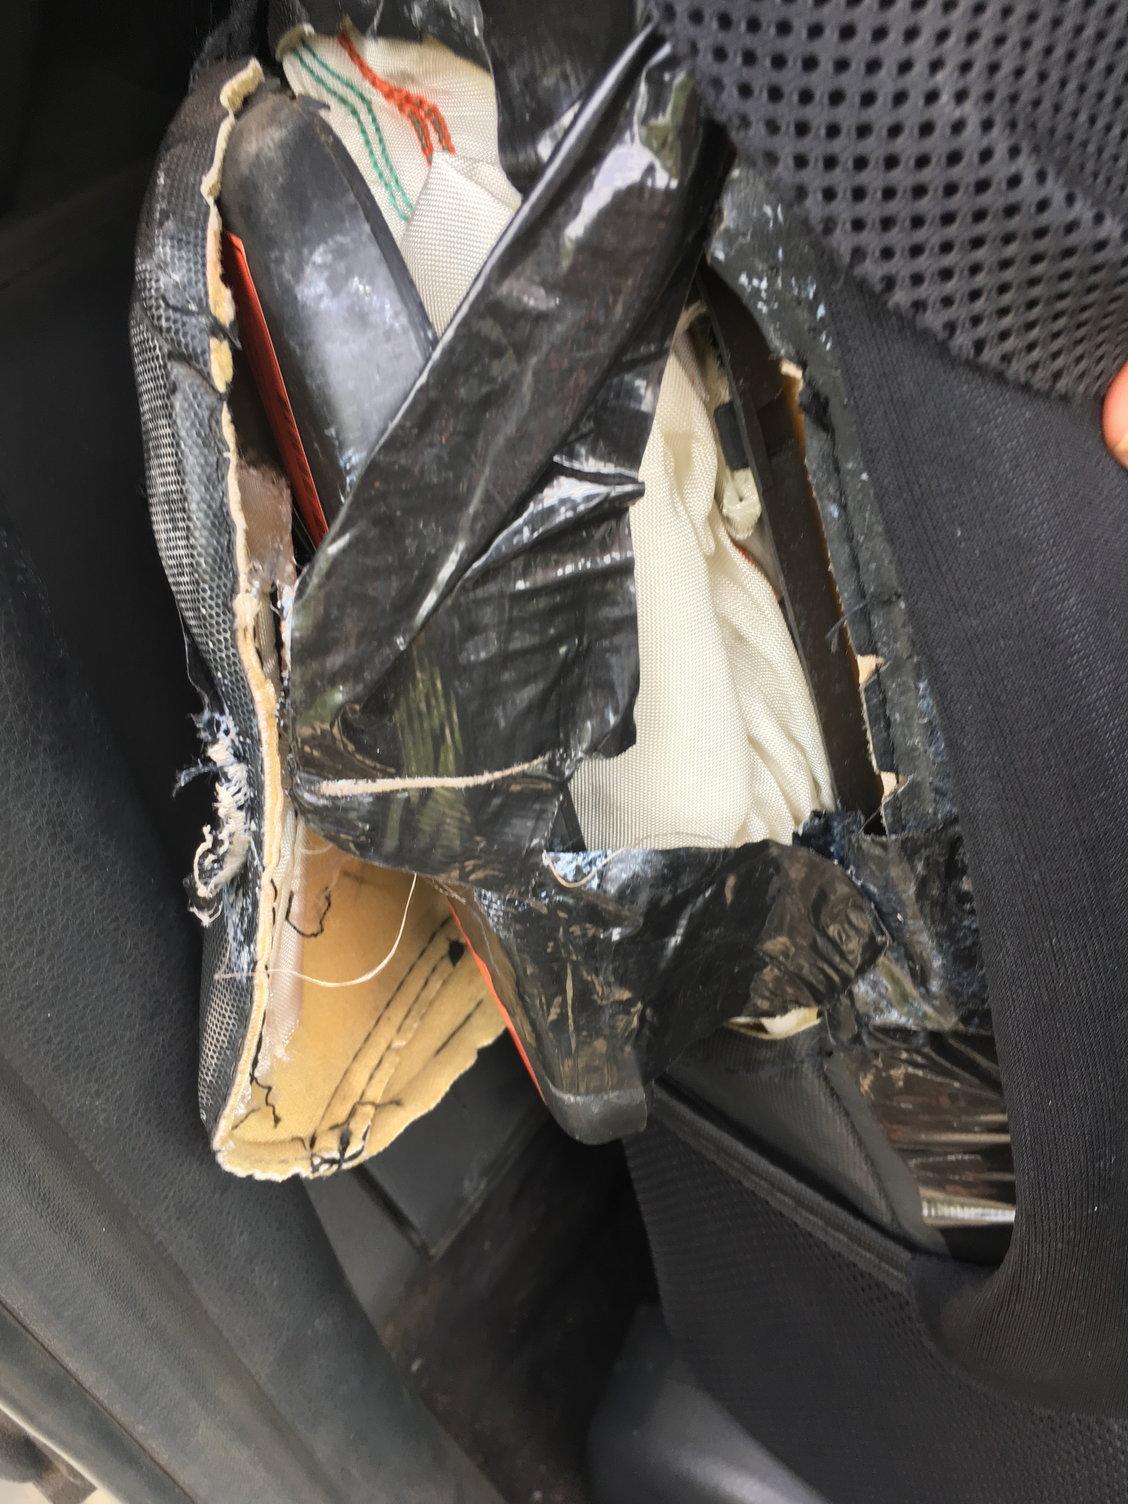 Ugh! Airbag problem - MY350Z COM - Nissan 350Z and 370Z Forum Discussion